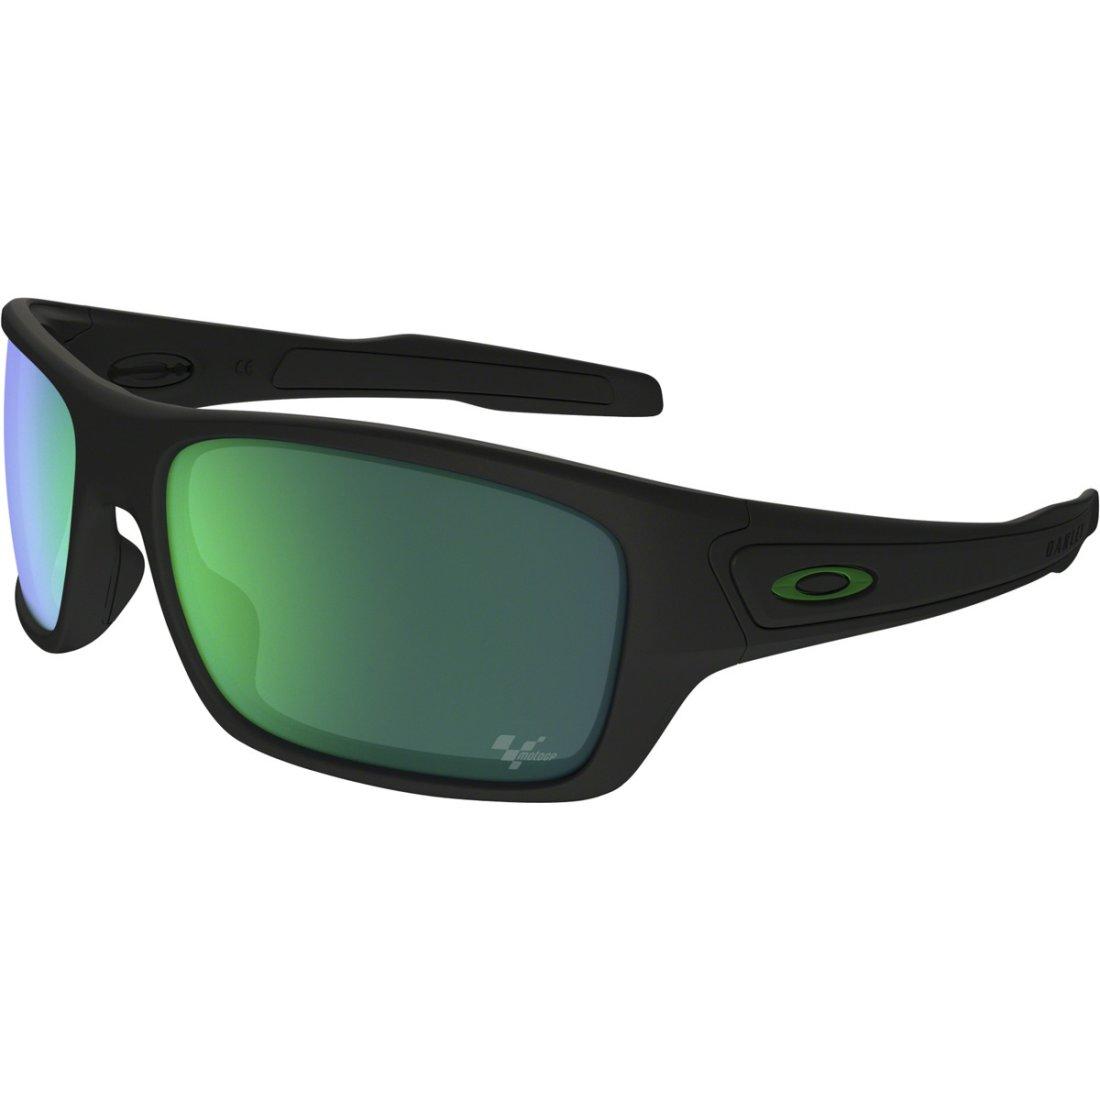 dbf6e9533d Gafas de sol OAKLEY Turbine Moto GP Matte Black / Jade Iridium · Motocard